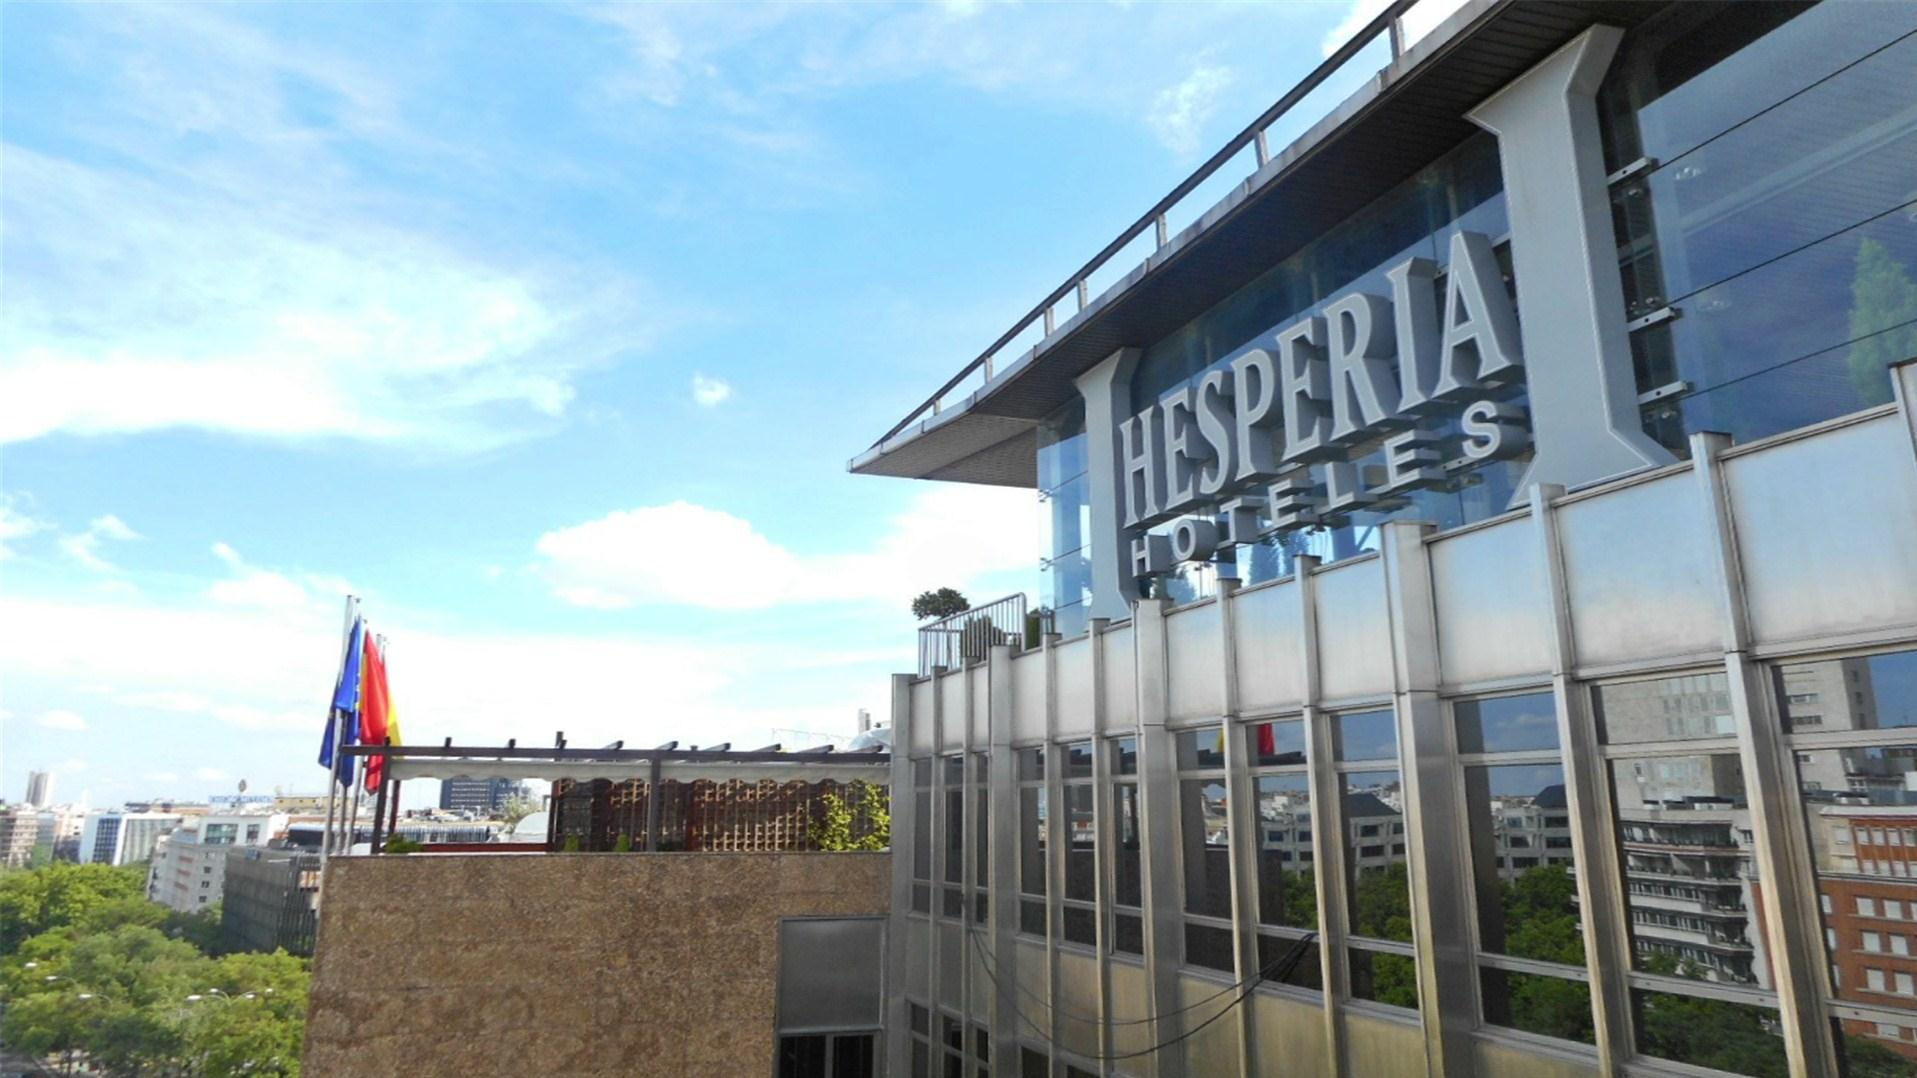 Hesperia Madridç????å????ç????æ????å°??çμ??æ????